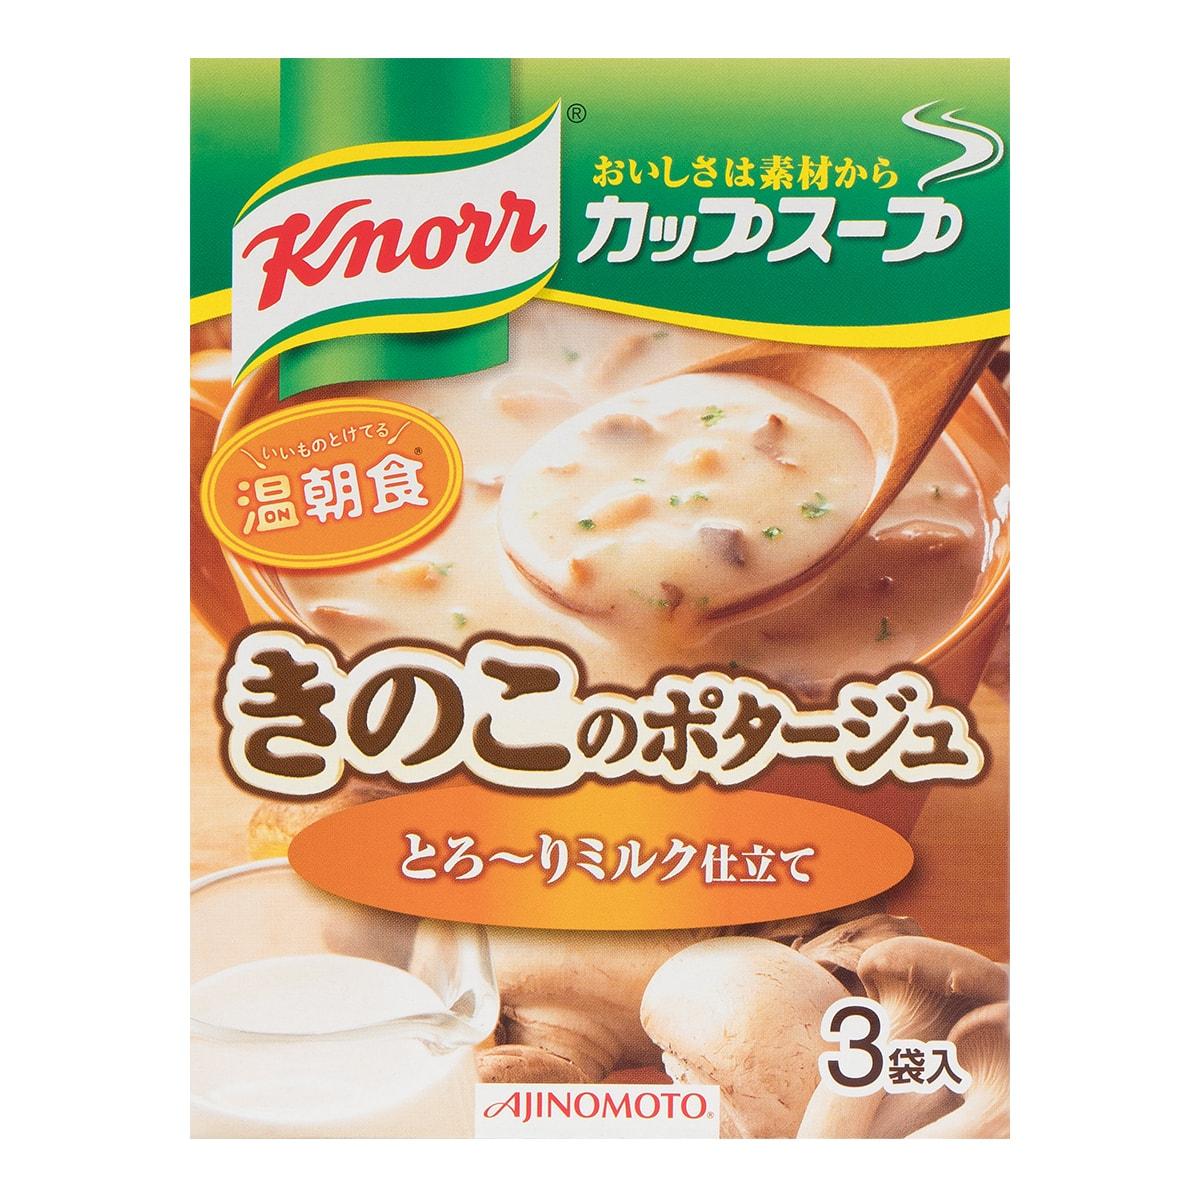 AJINOMOTO Instant Powder Soup Mushroom 3pcs 42.9g